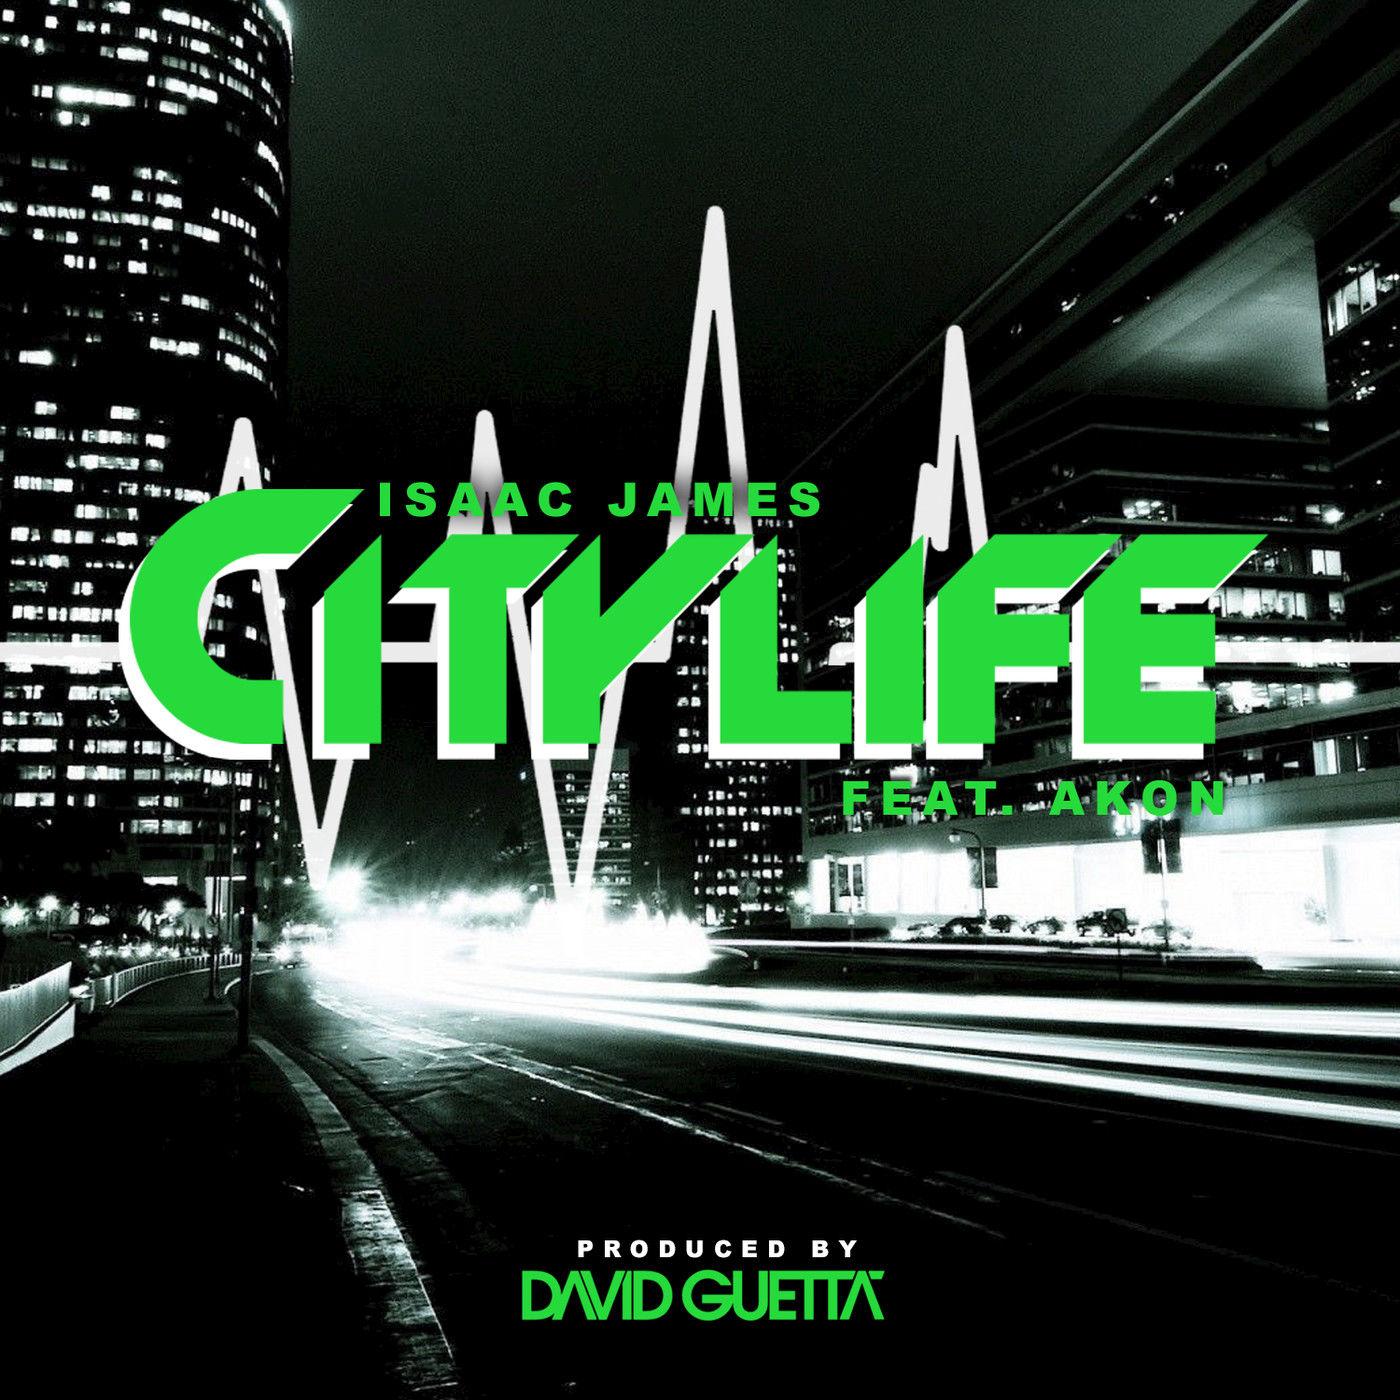 Isaac James - City Life (feat. Akon) - Single Cover